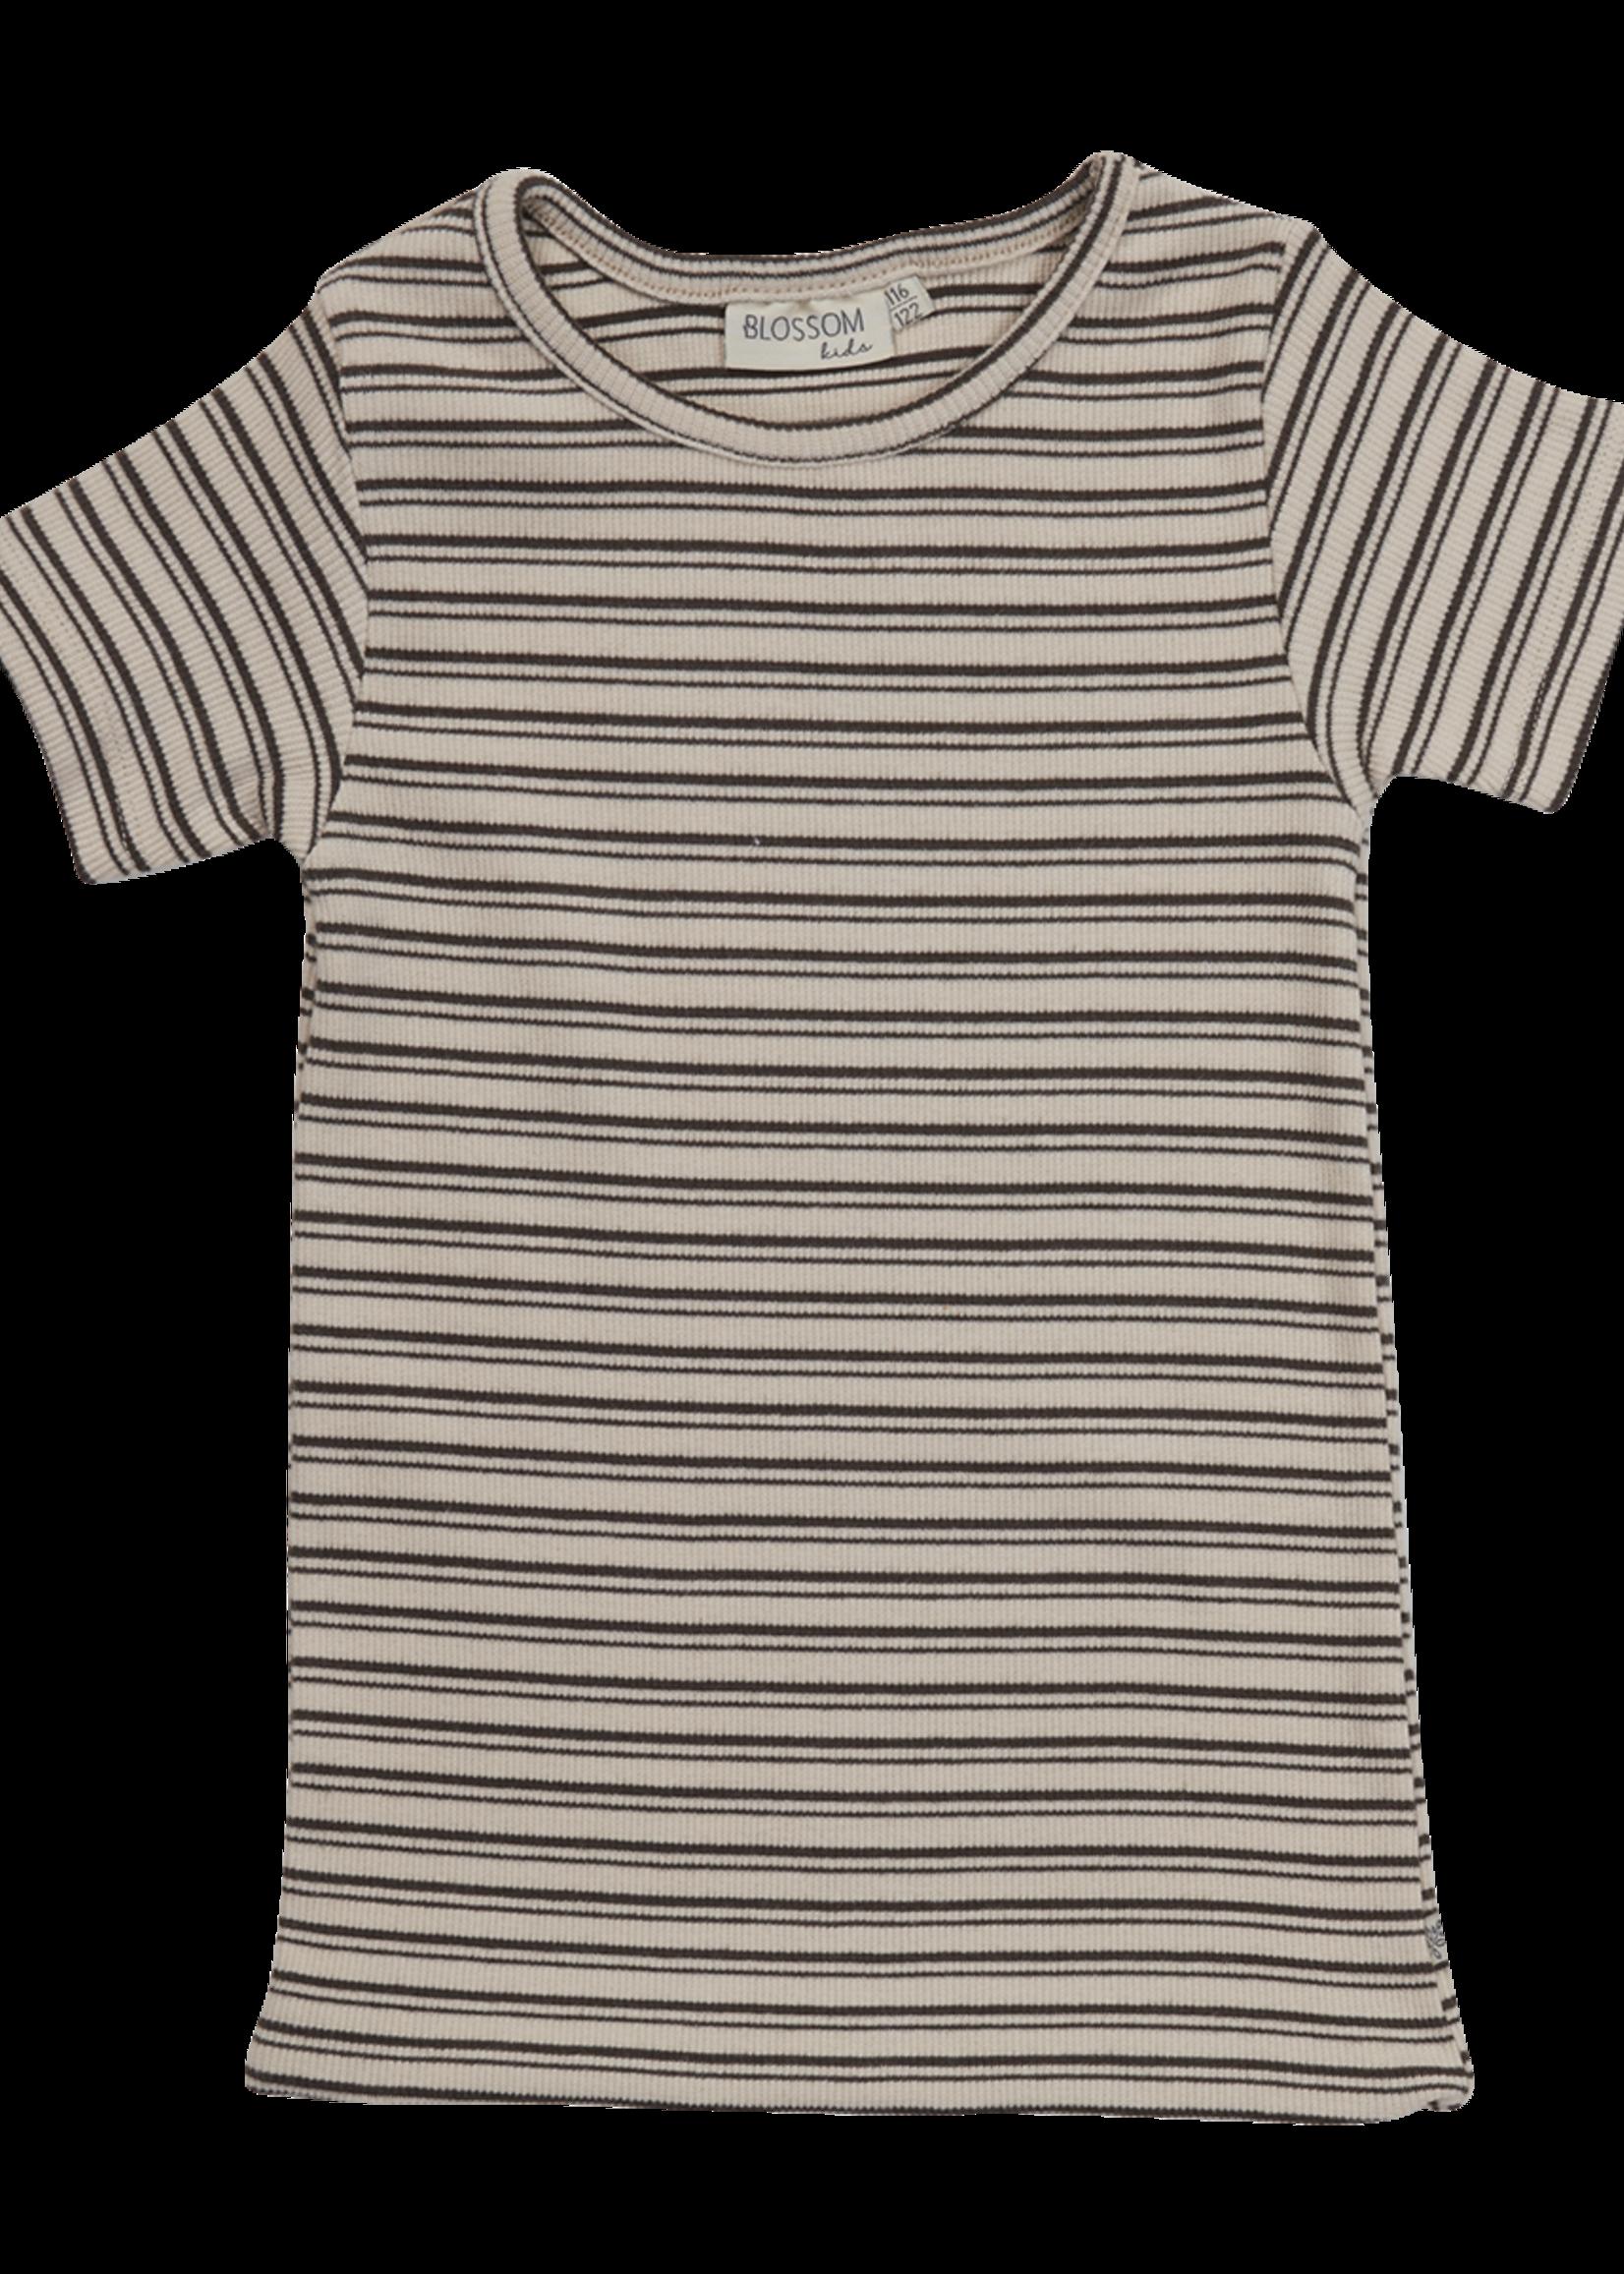 Blossom Kids Short sleeve shirt - Stripes - Cinnamon